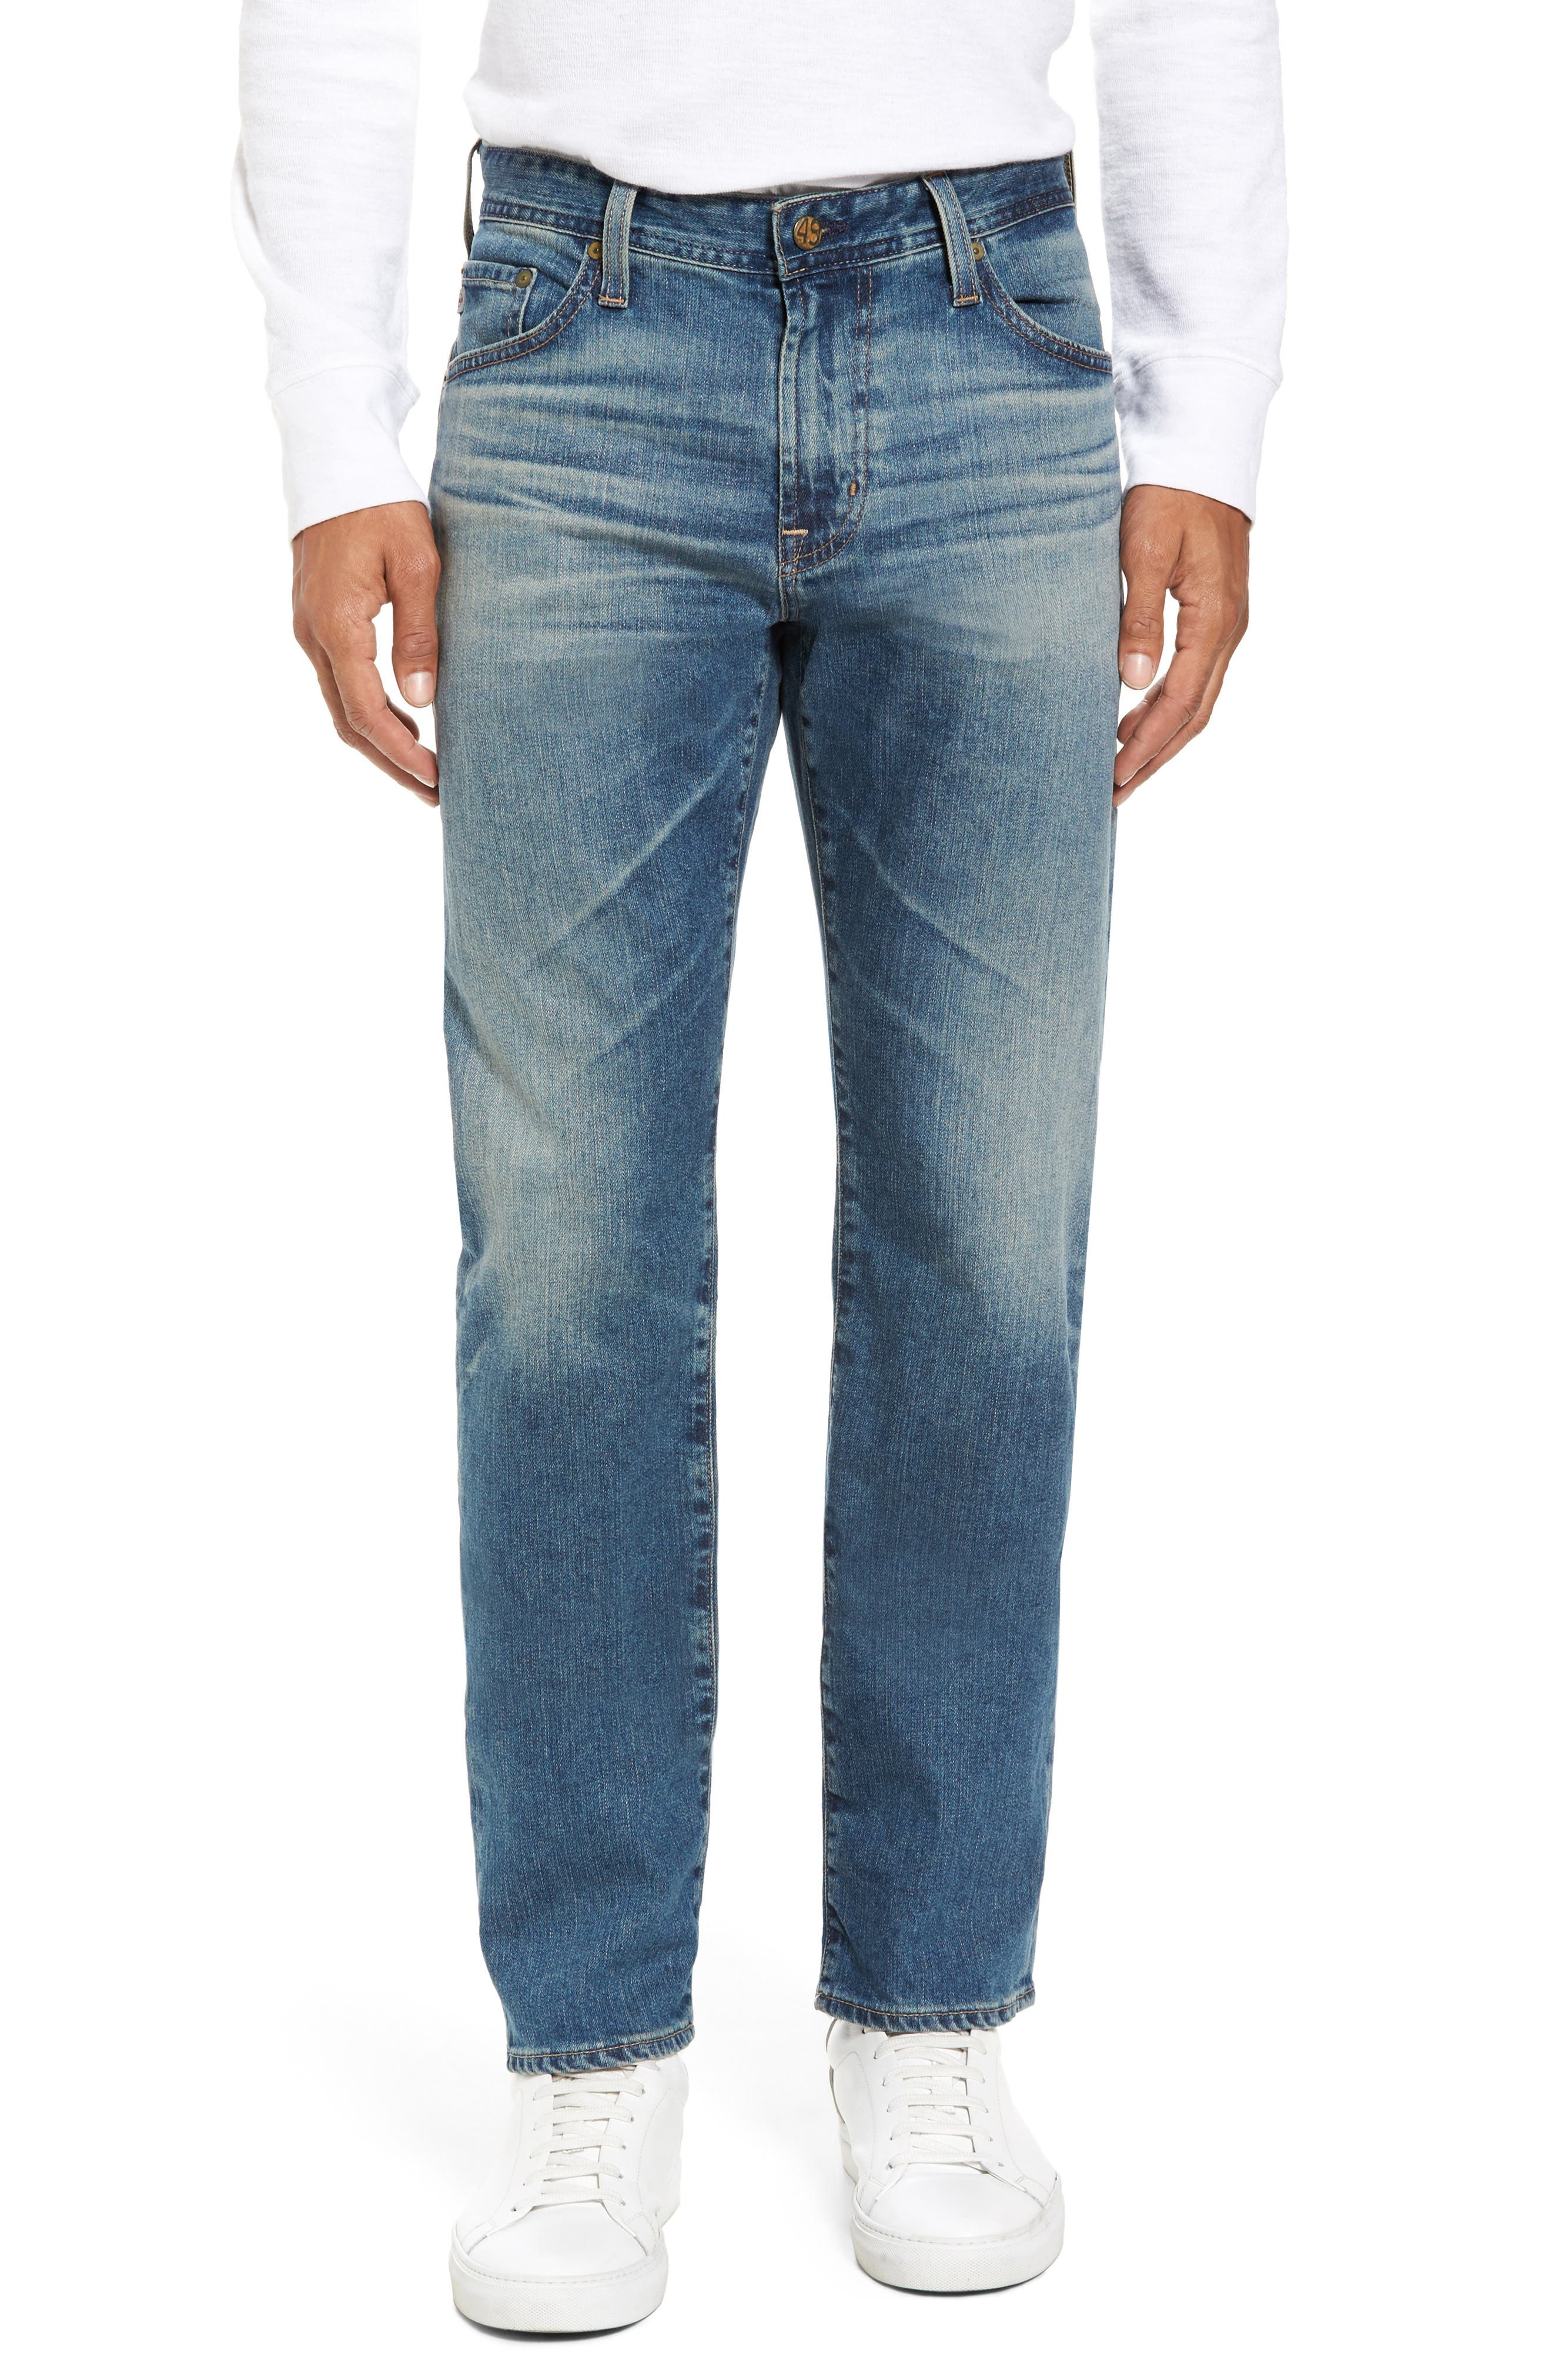 Graduate Slim Straight Leg Jeans,                             Main thumbnail 1, color,                             430